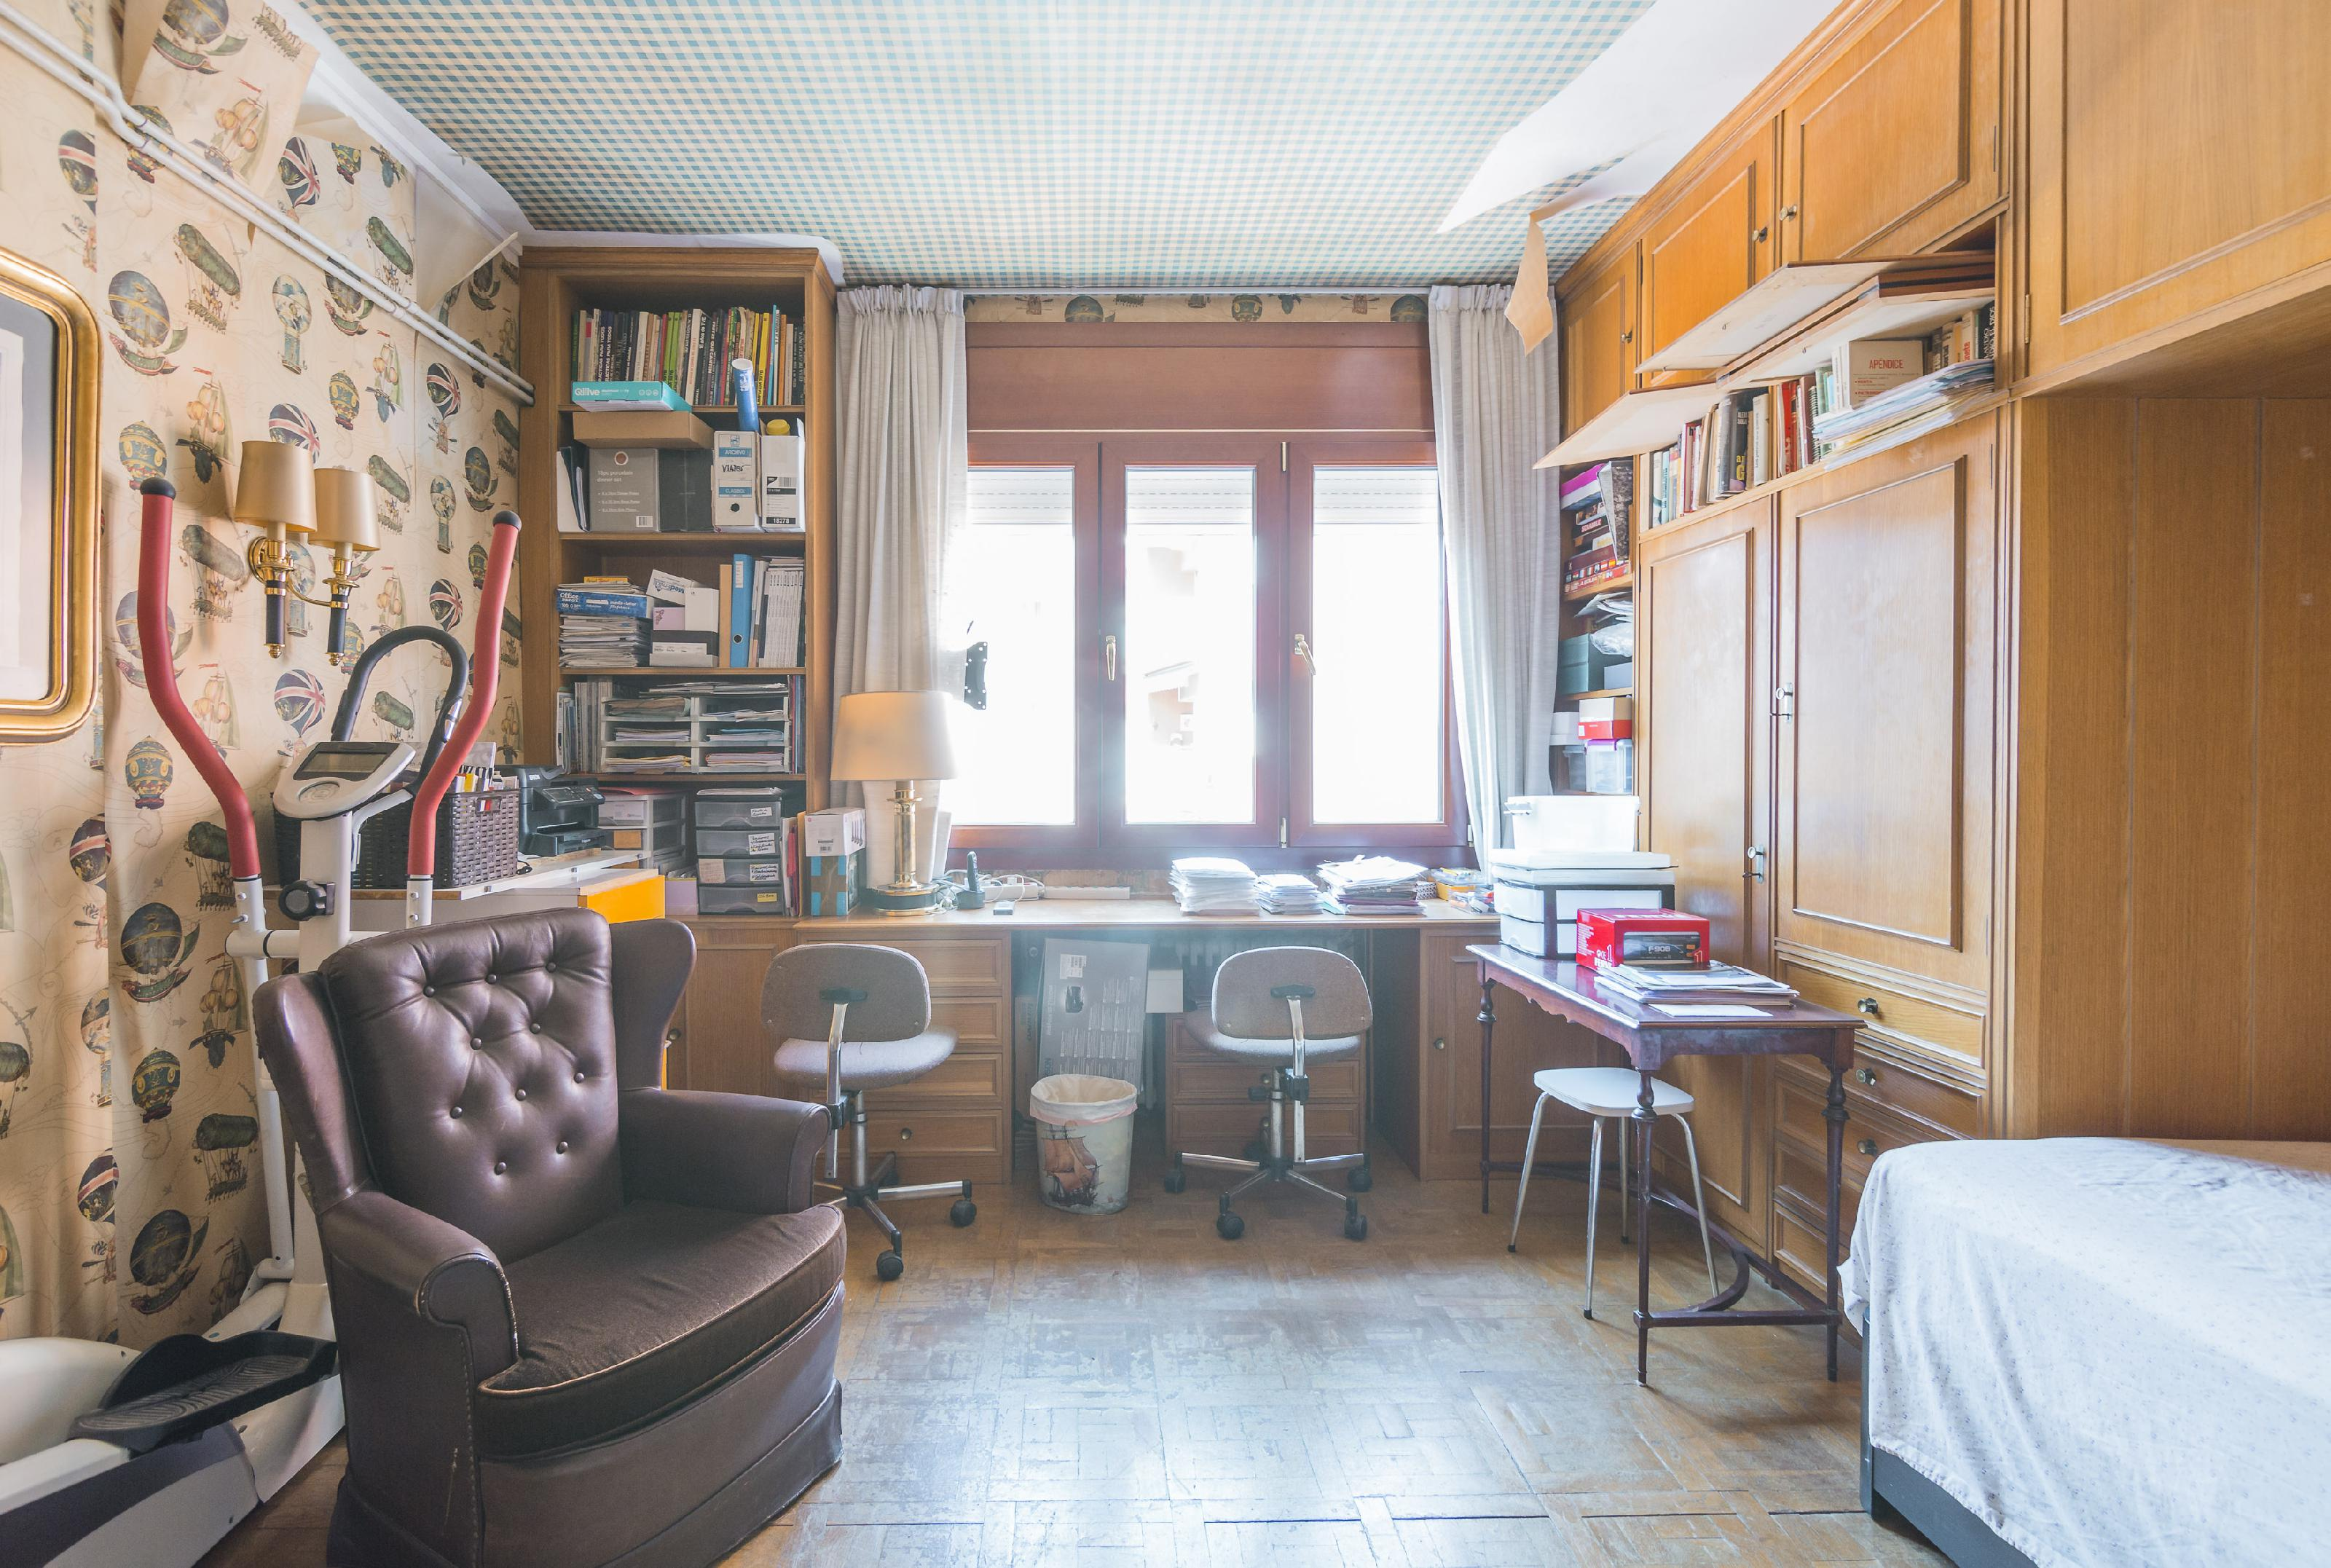 249856 Flat for sale in Sarrià-Sant Gervasi, Sant Gervasi-Galvany 30